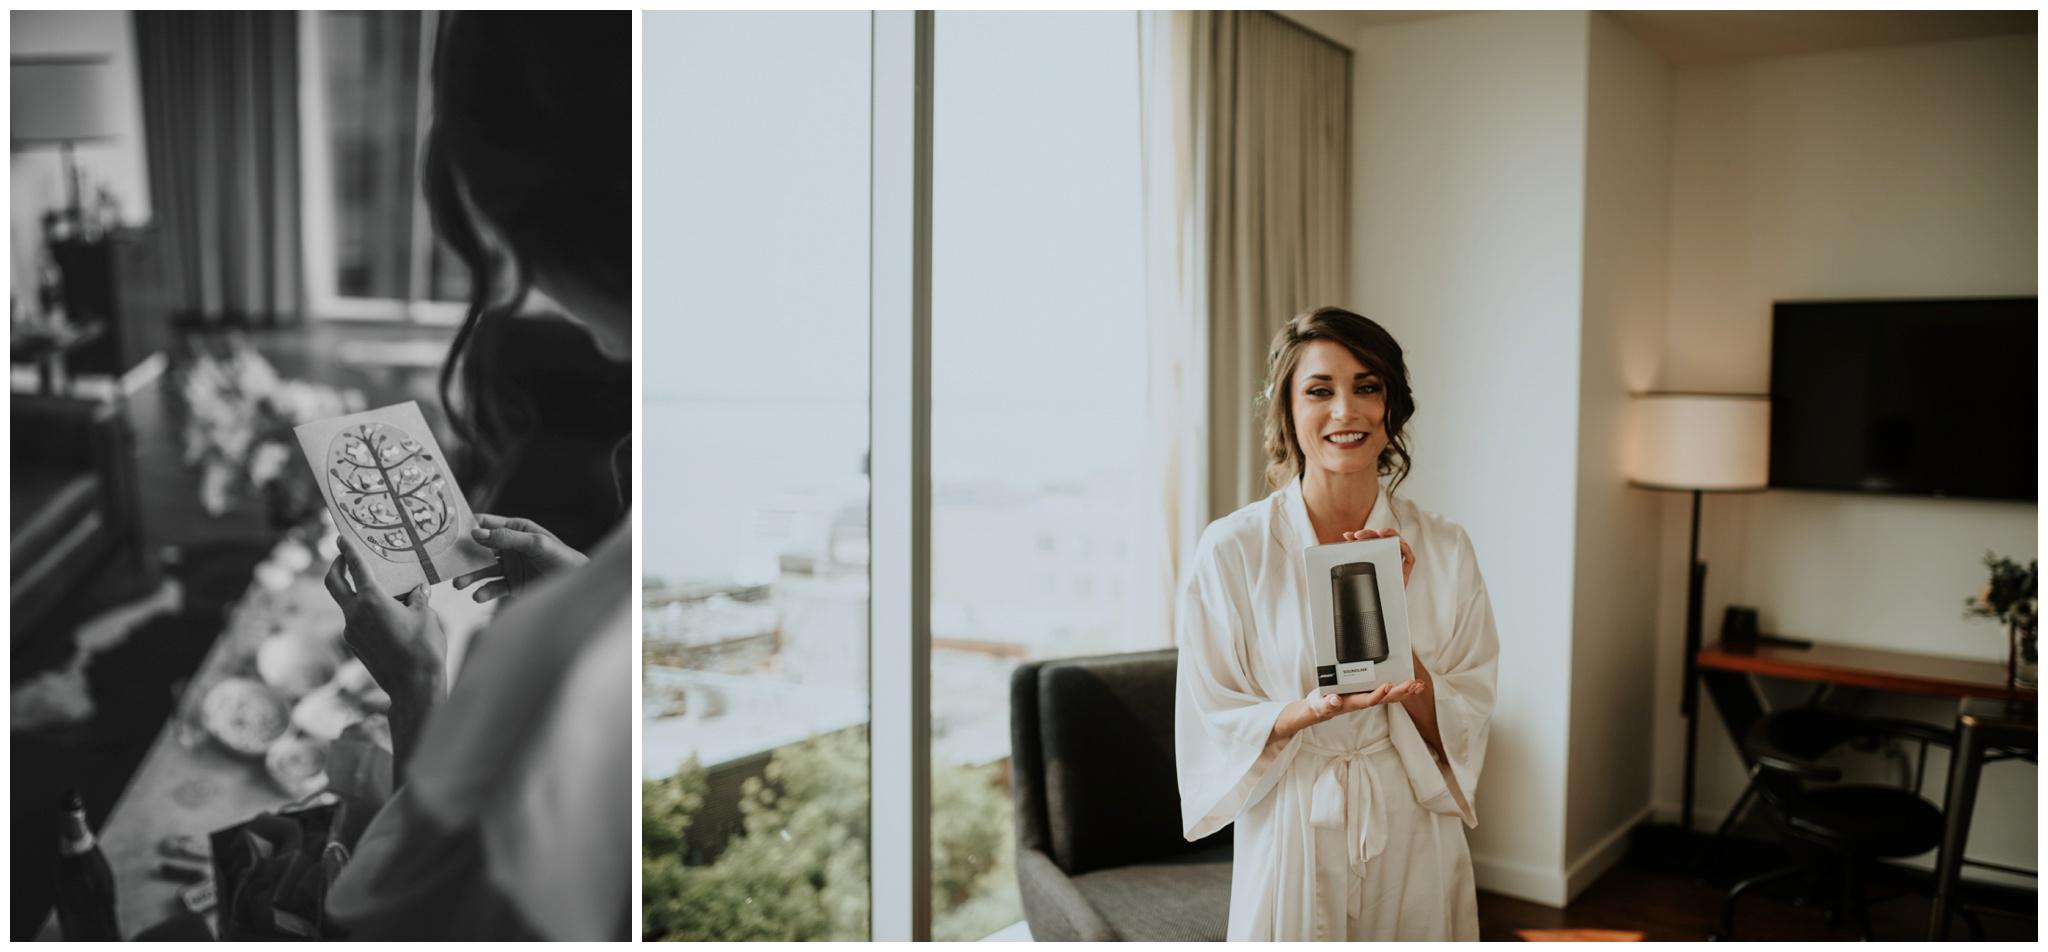 alyssa-keiran-westland-distillery-urban-seattle-wedding-photographer-caitlyn-nikula-35.jpg